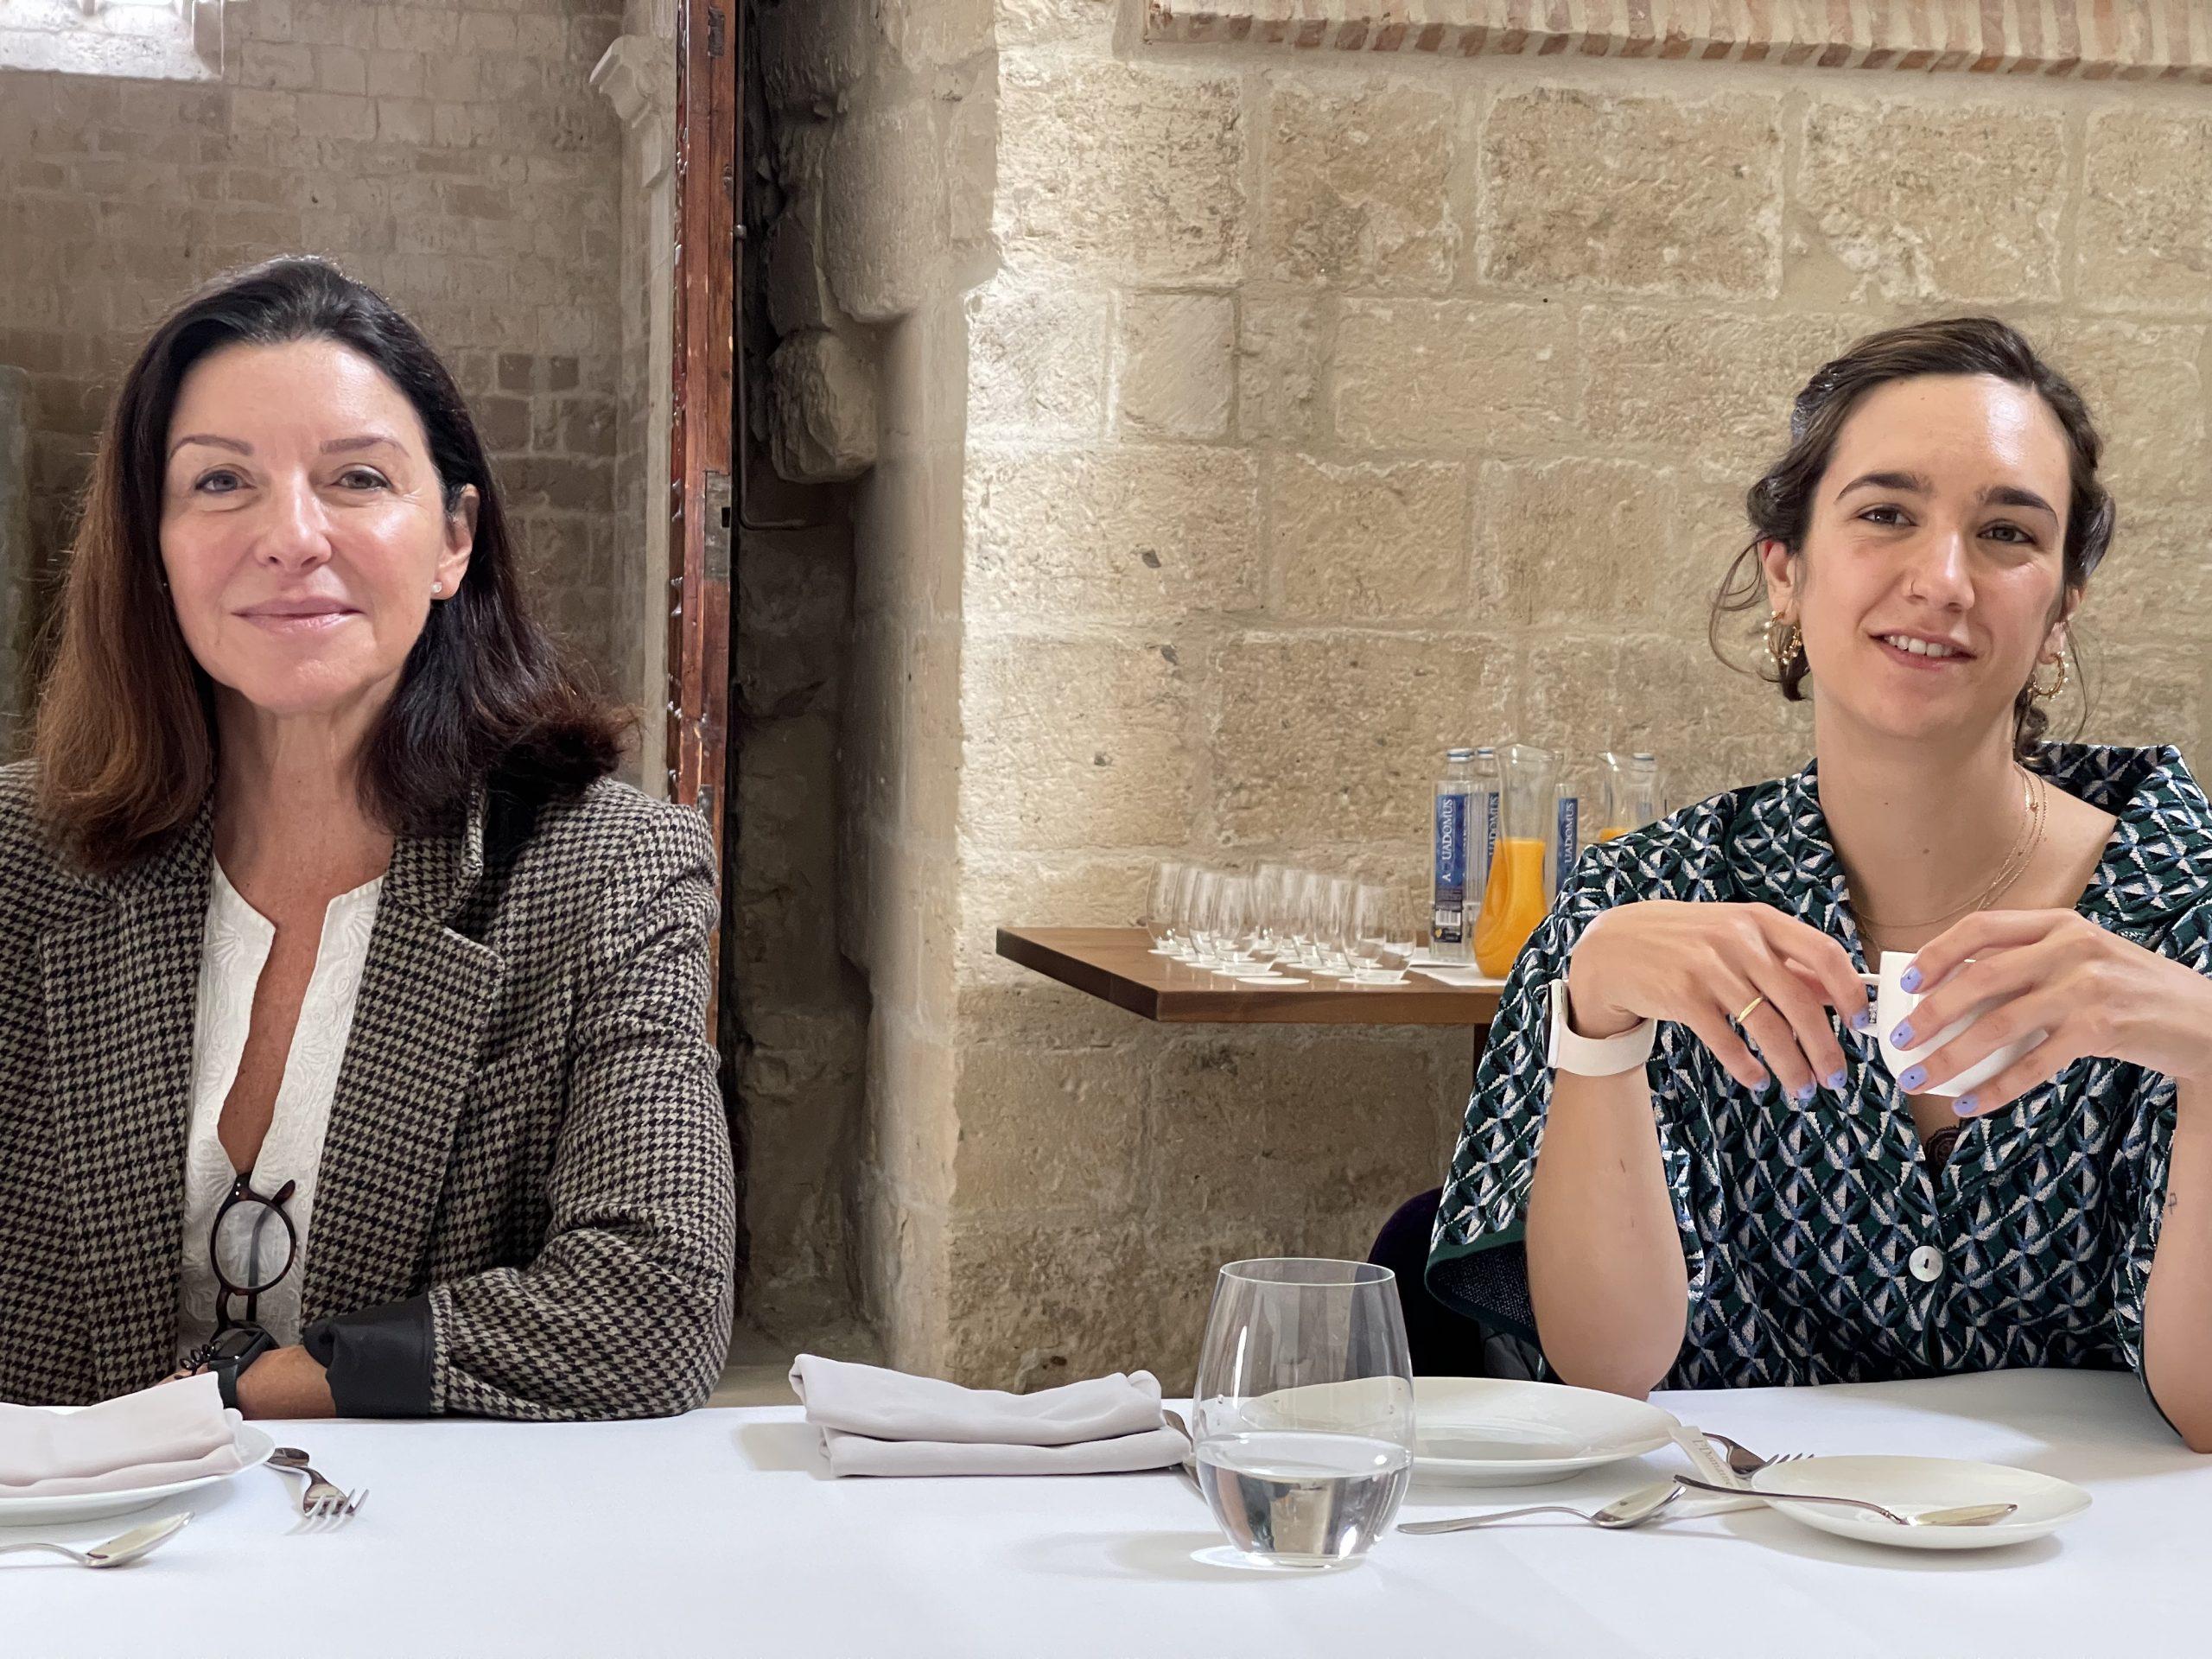 Alejandra Vallejo-Nájera y Cristina Barroso